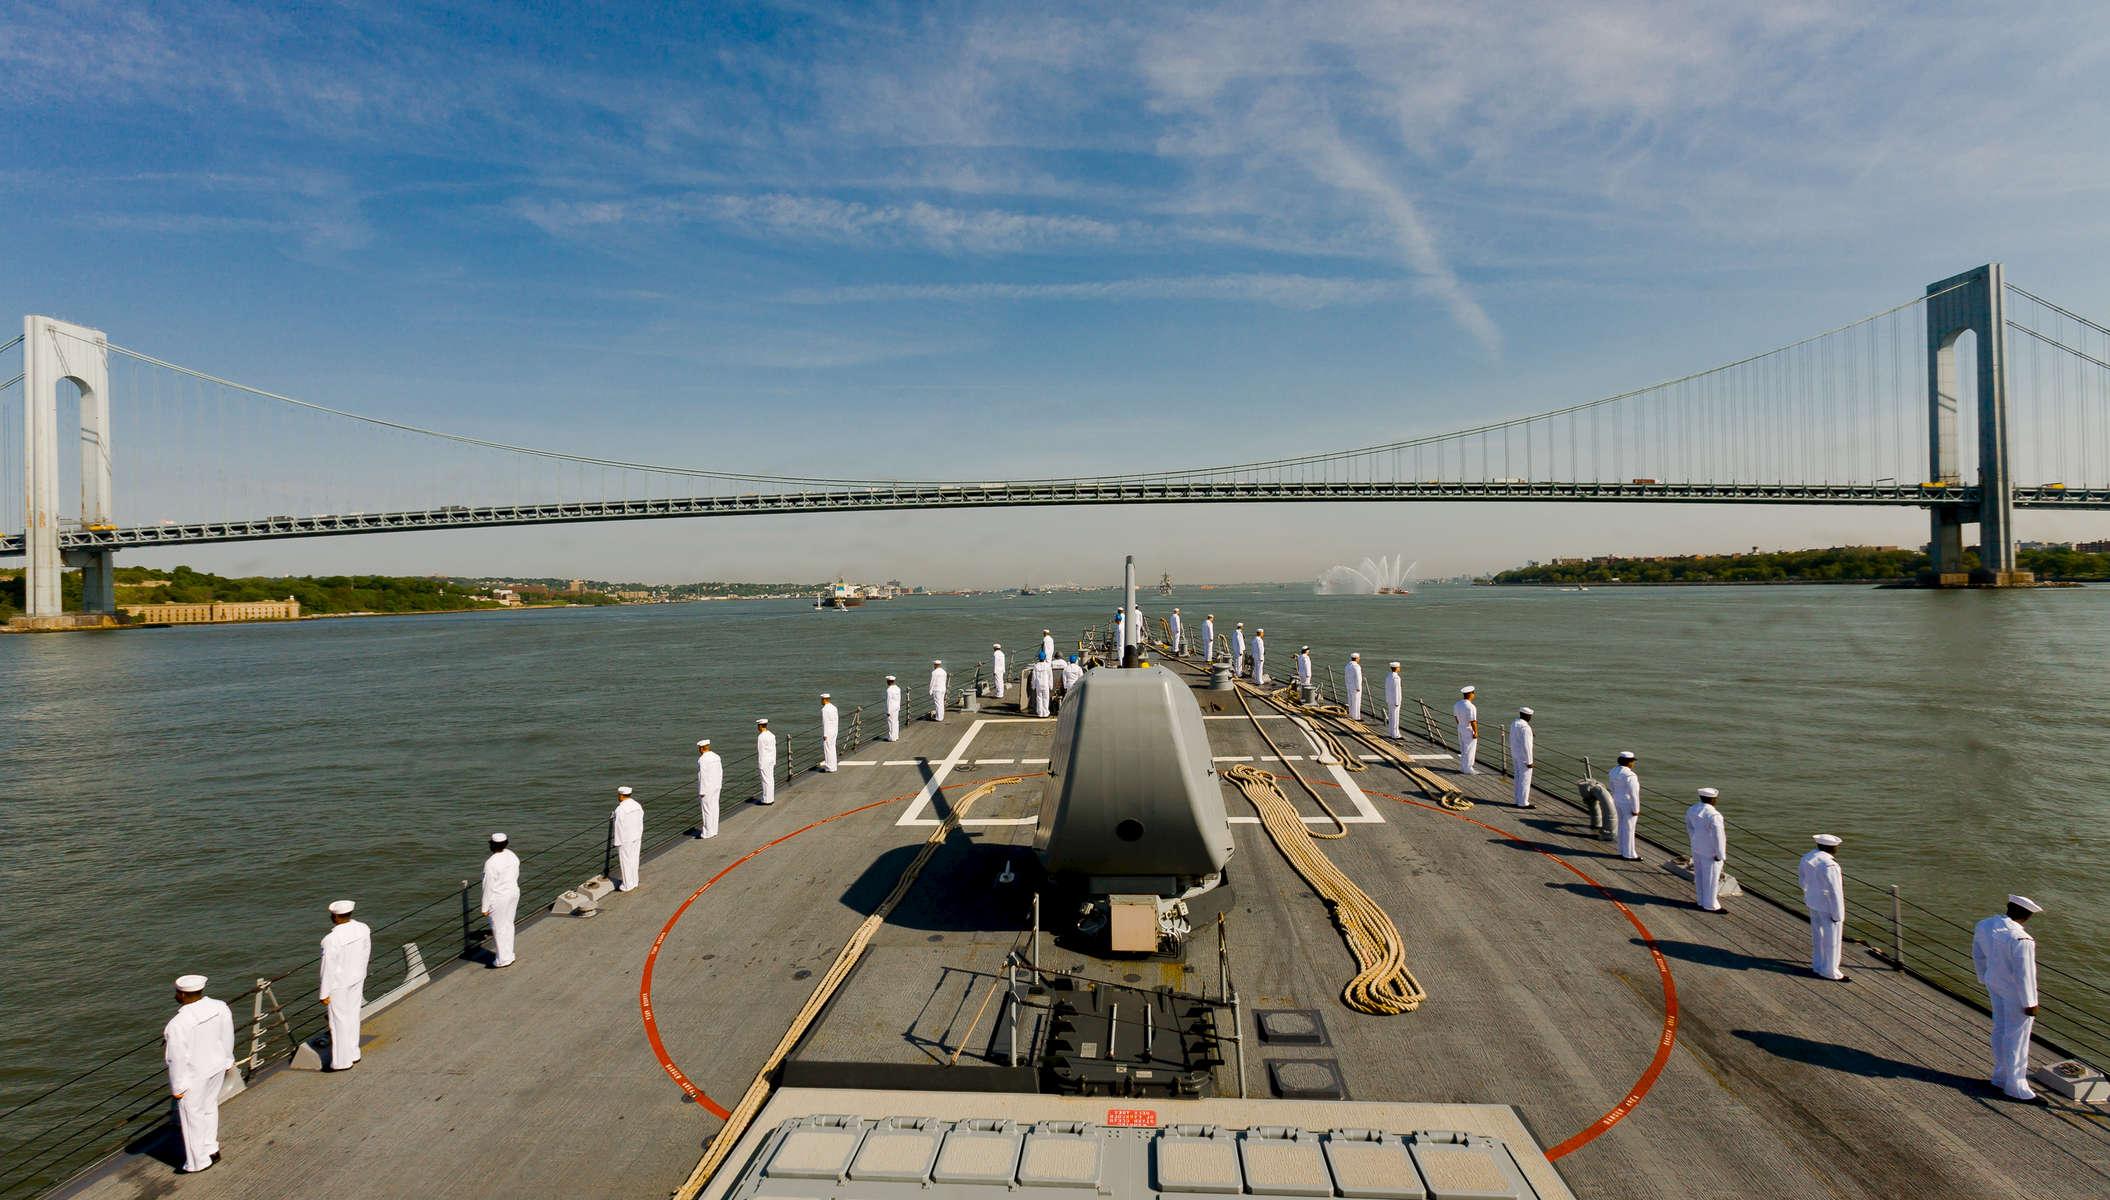 Fleet Week aboard USN Destroyer Oscar Austin, May 23, 2007